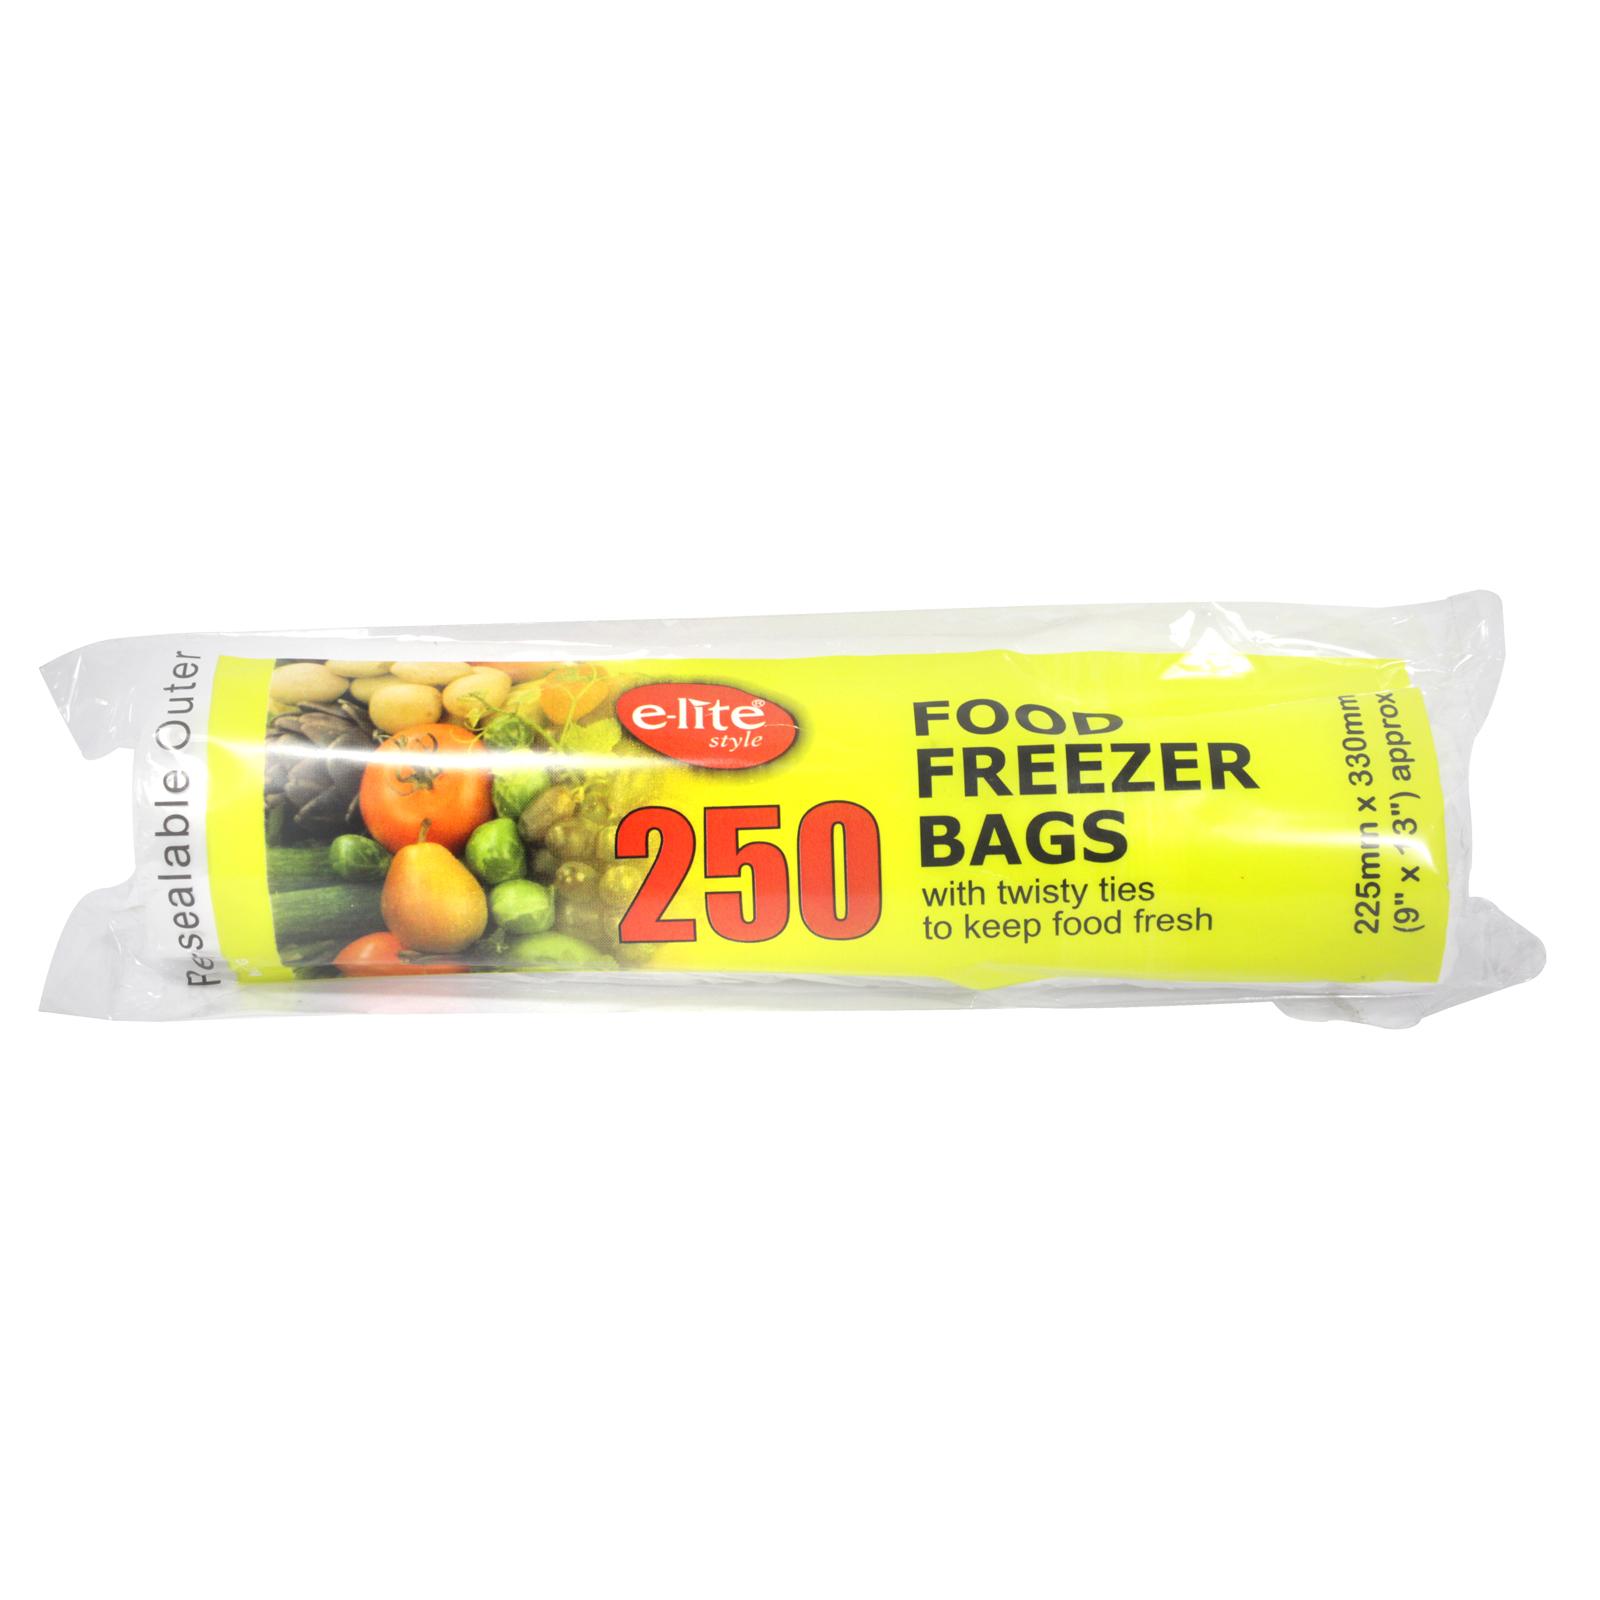 E-LITE STYLE 250 FOOD FREEZER BAG 9X13